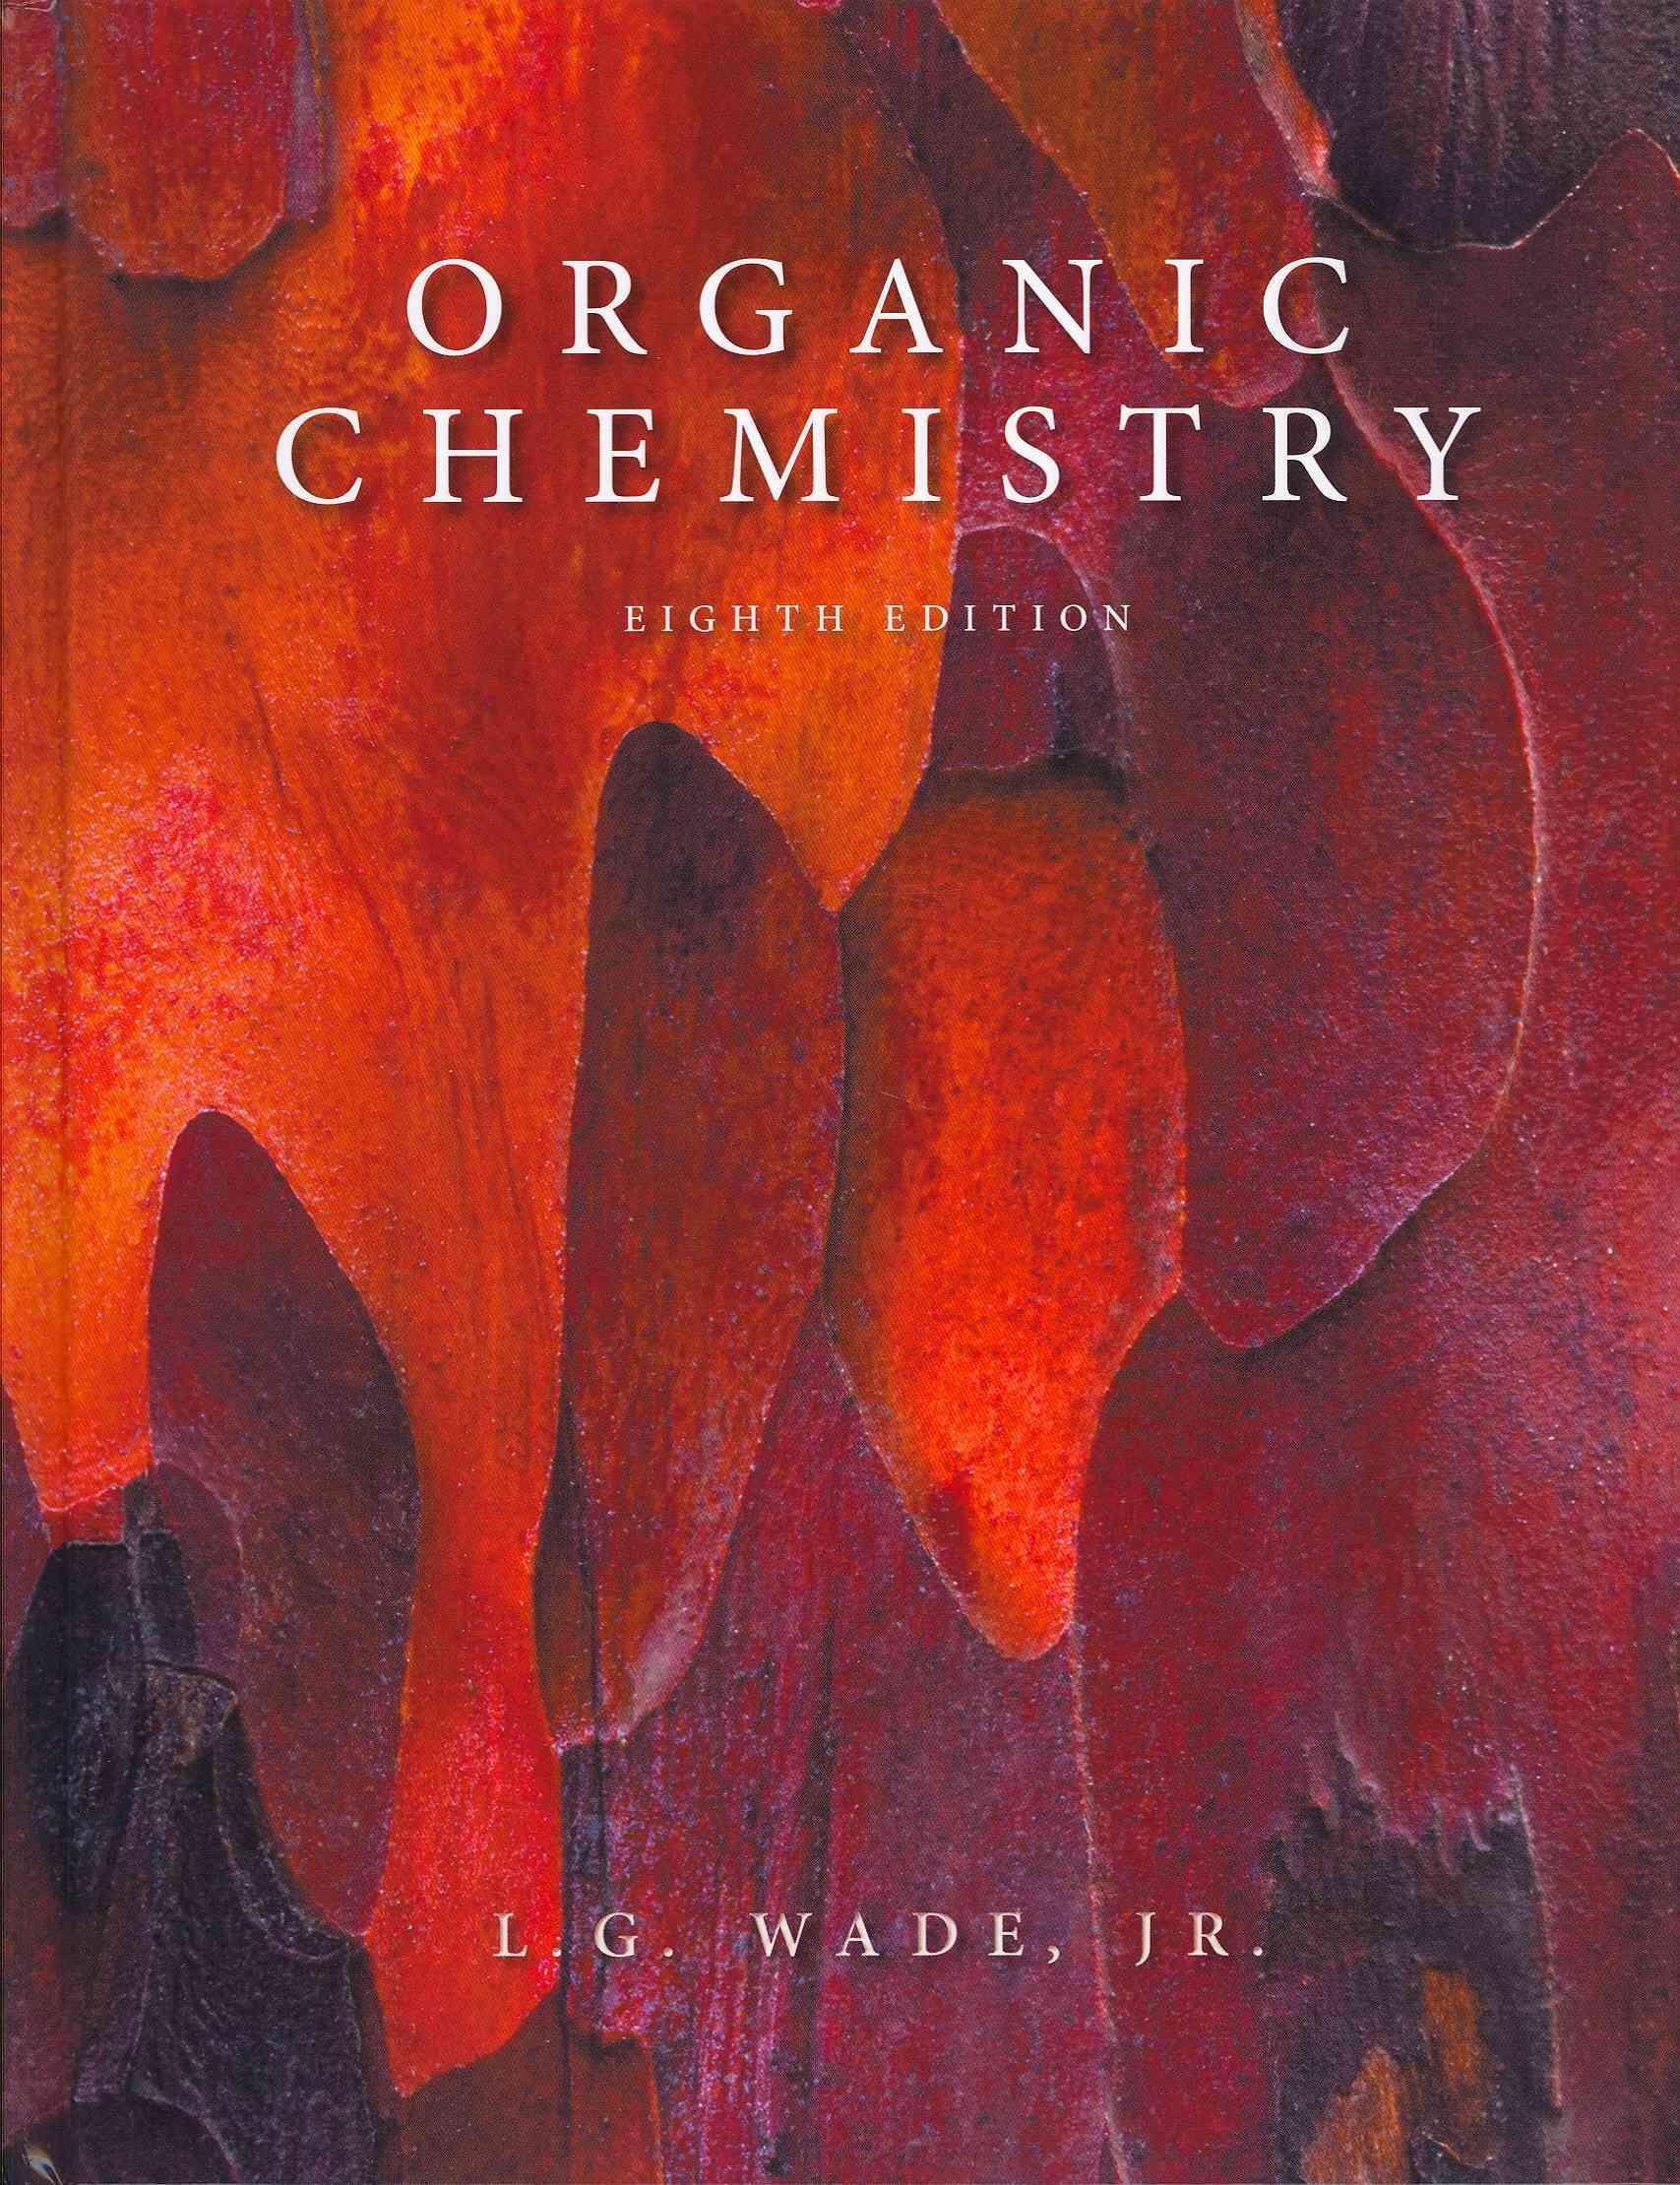 Organic Chemistry (Leroy Wade, Jan William Simek) [9th Edition] - Like New